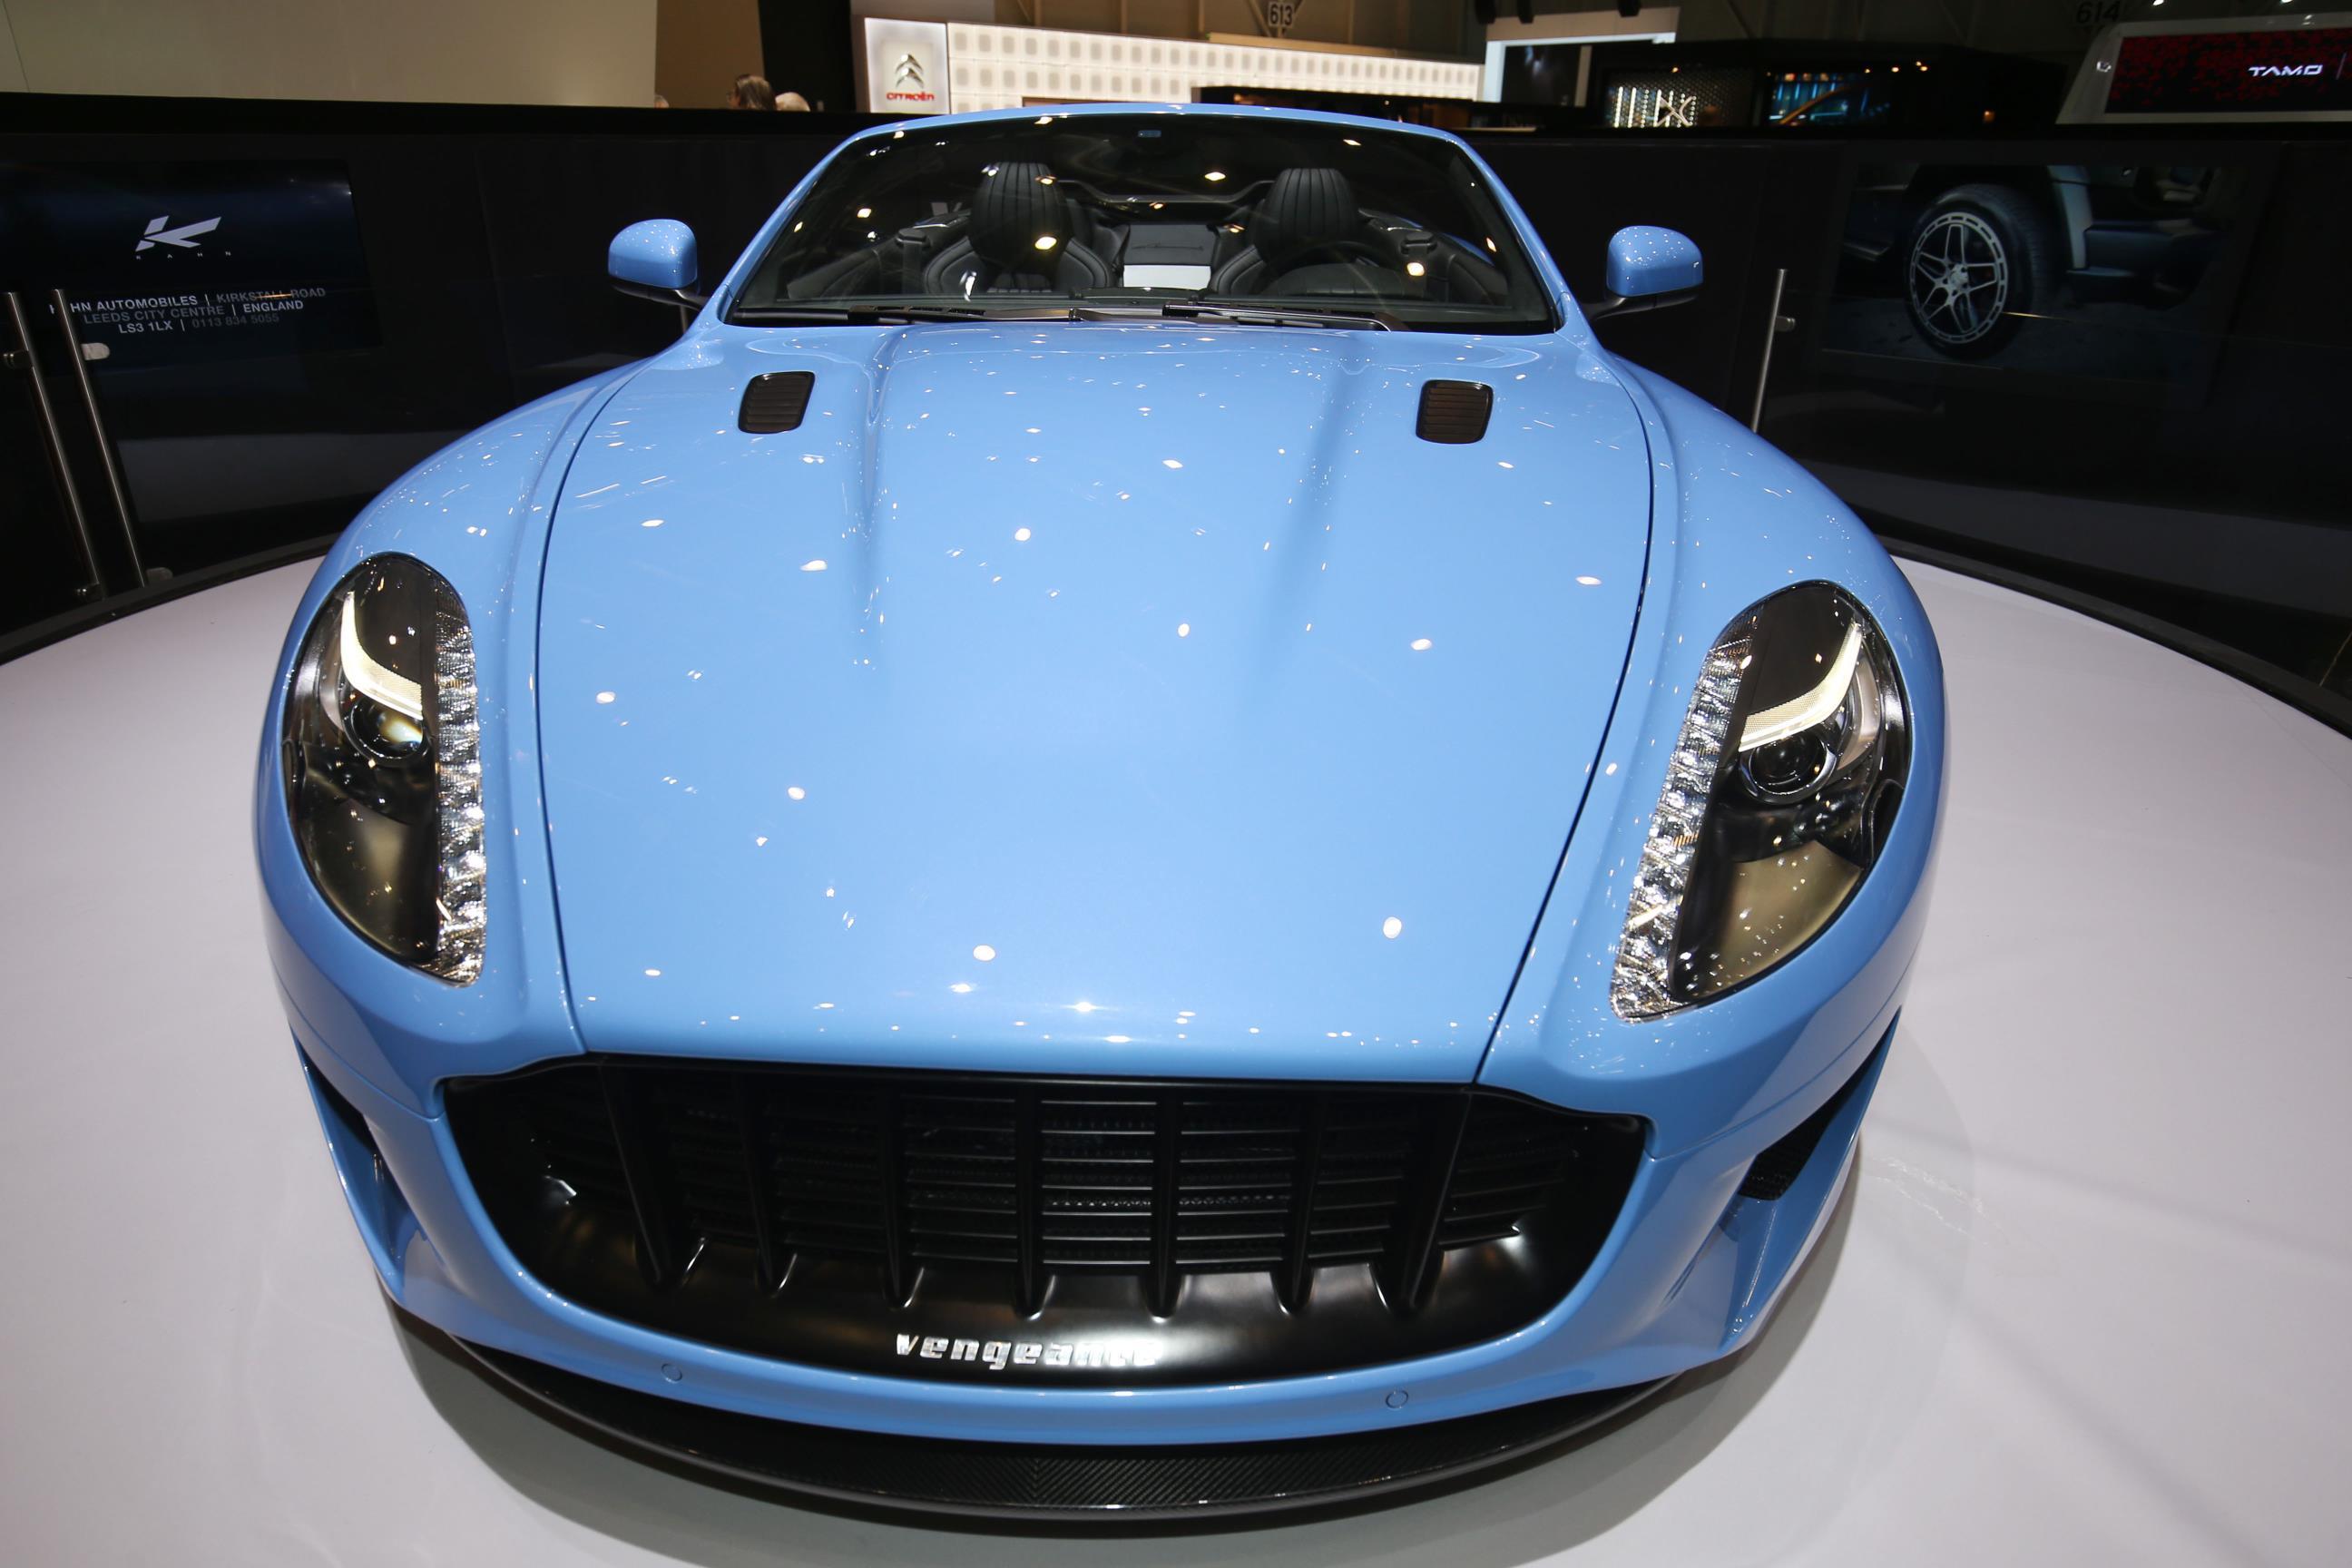 Aston Martin Db5 Becomes Supermarine Spitfire That Drifts Like A Sir